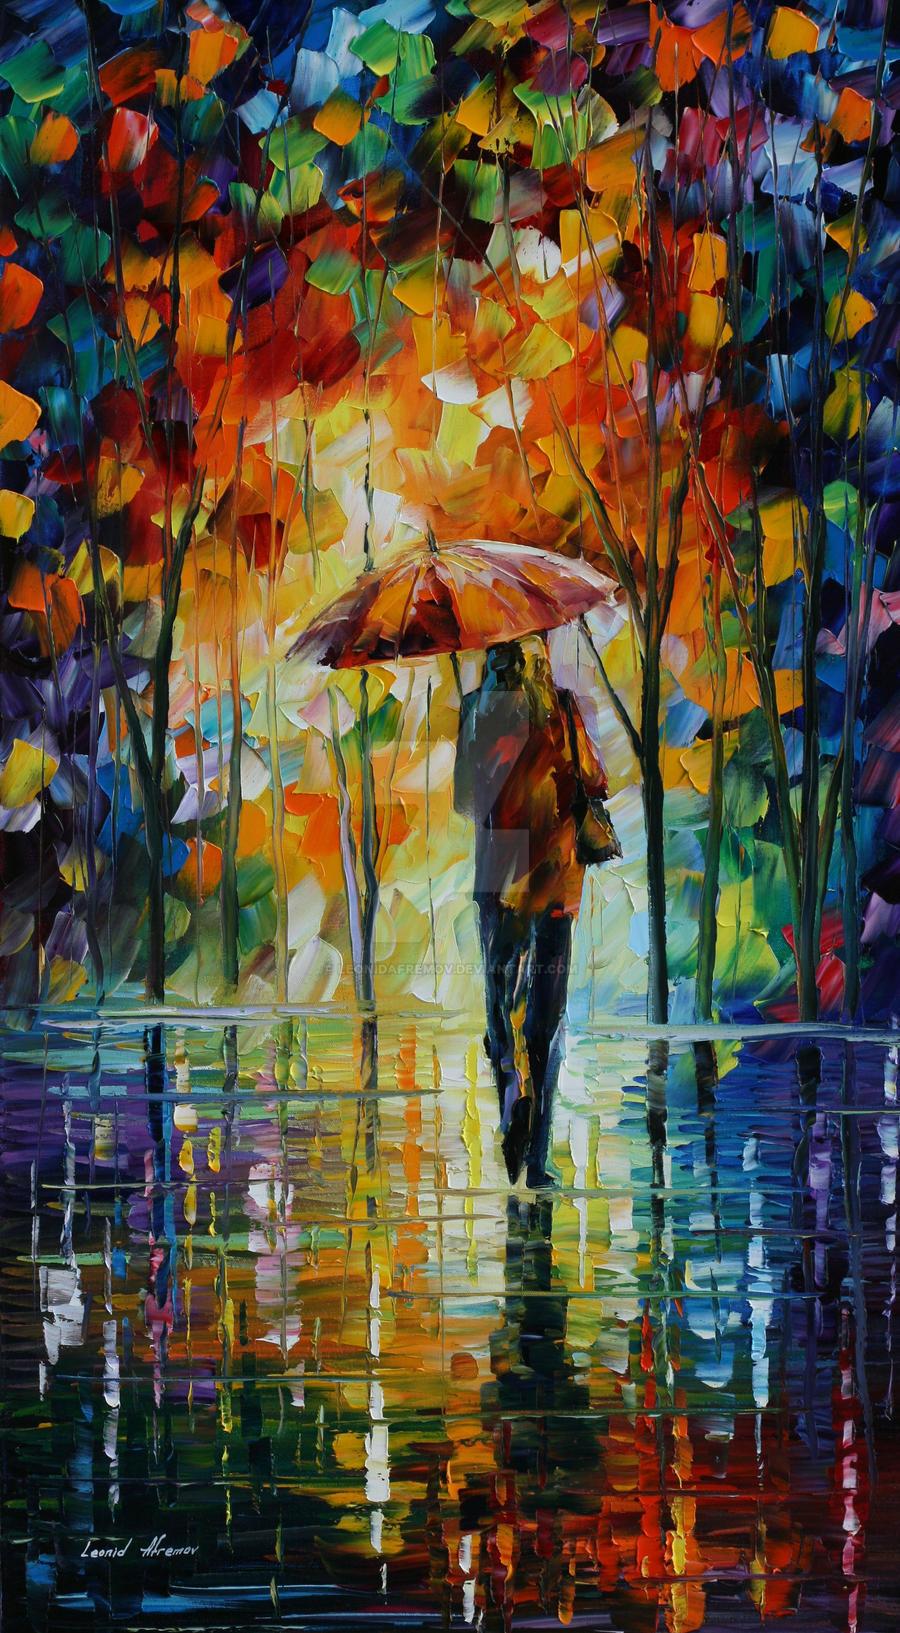 Toward love by Leonid Afremov by Leonidafremov